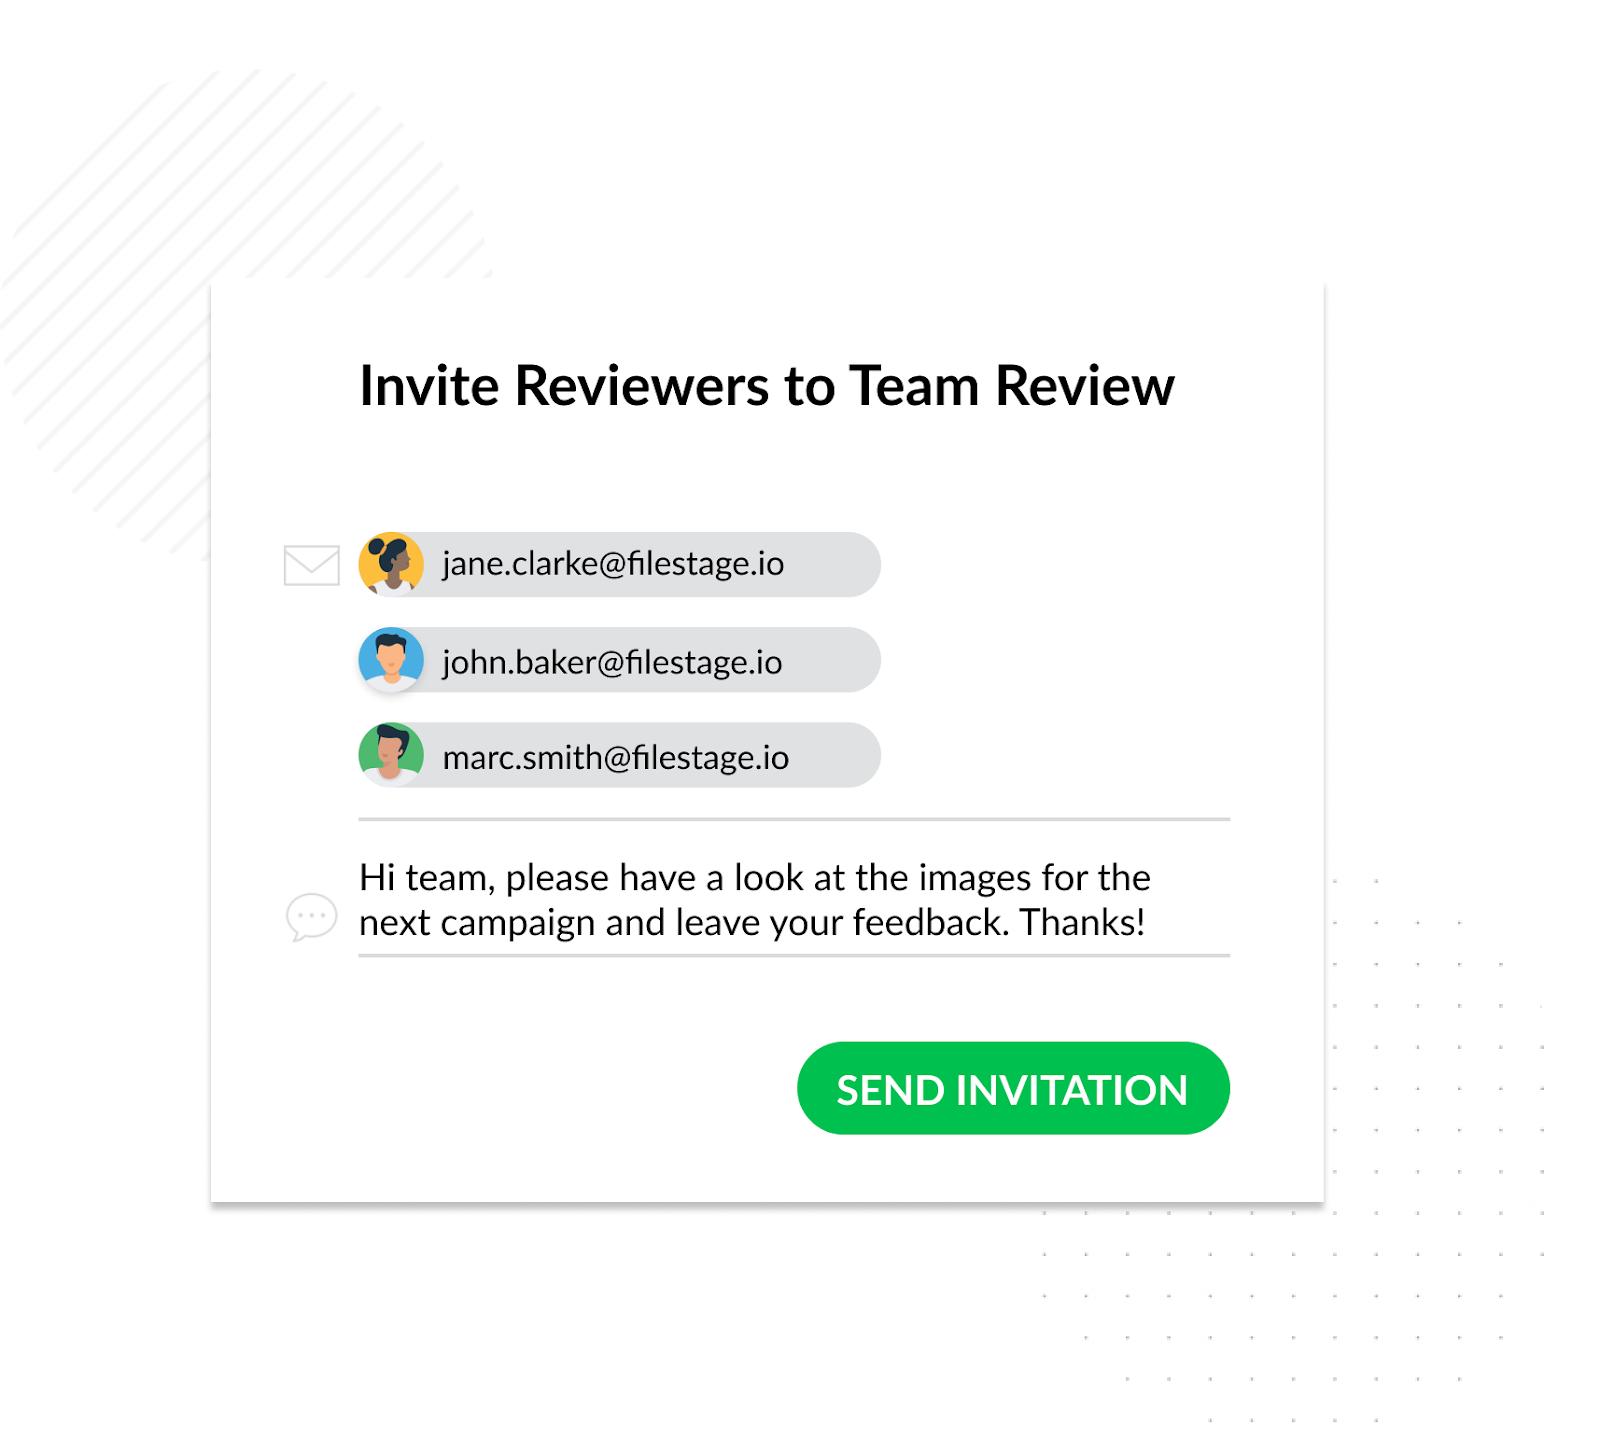 invite reviews to team review